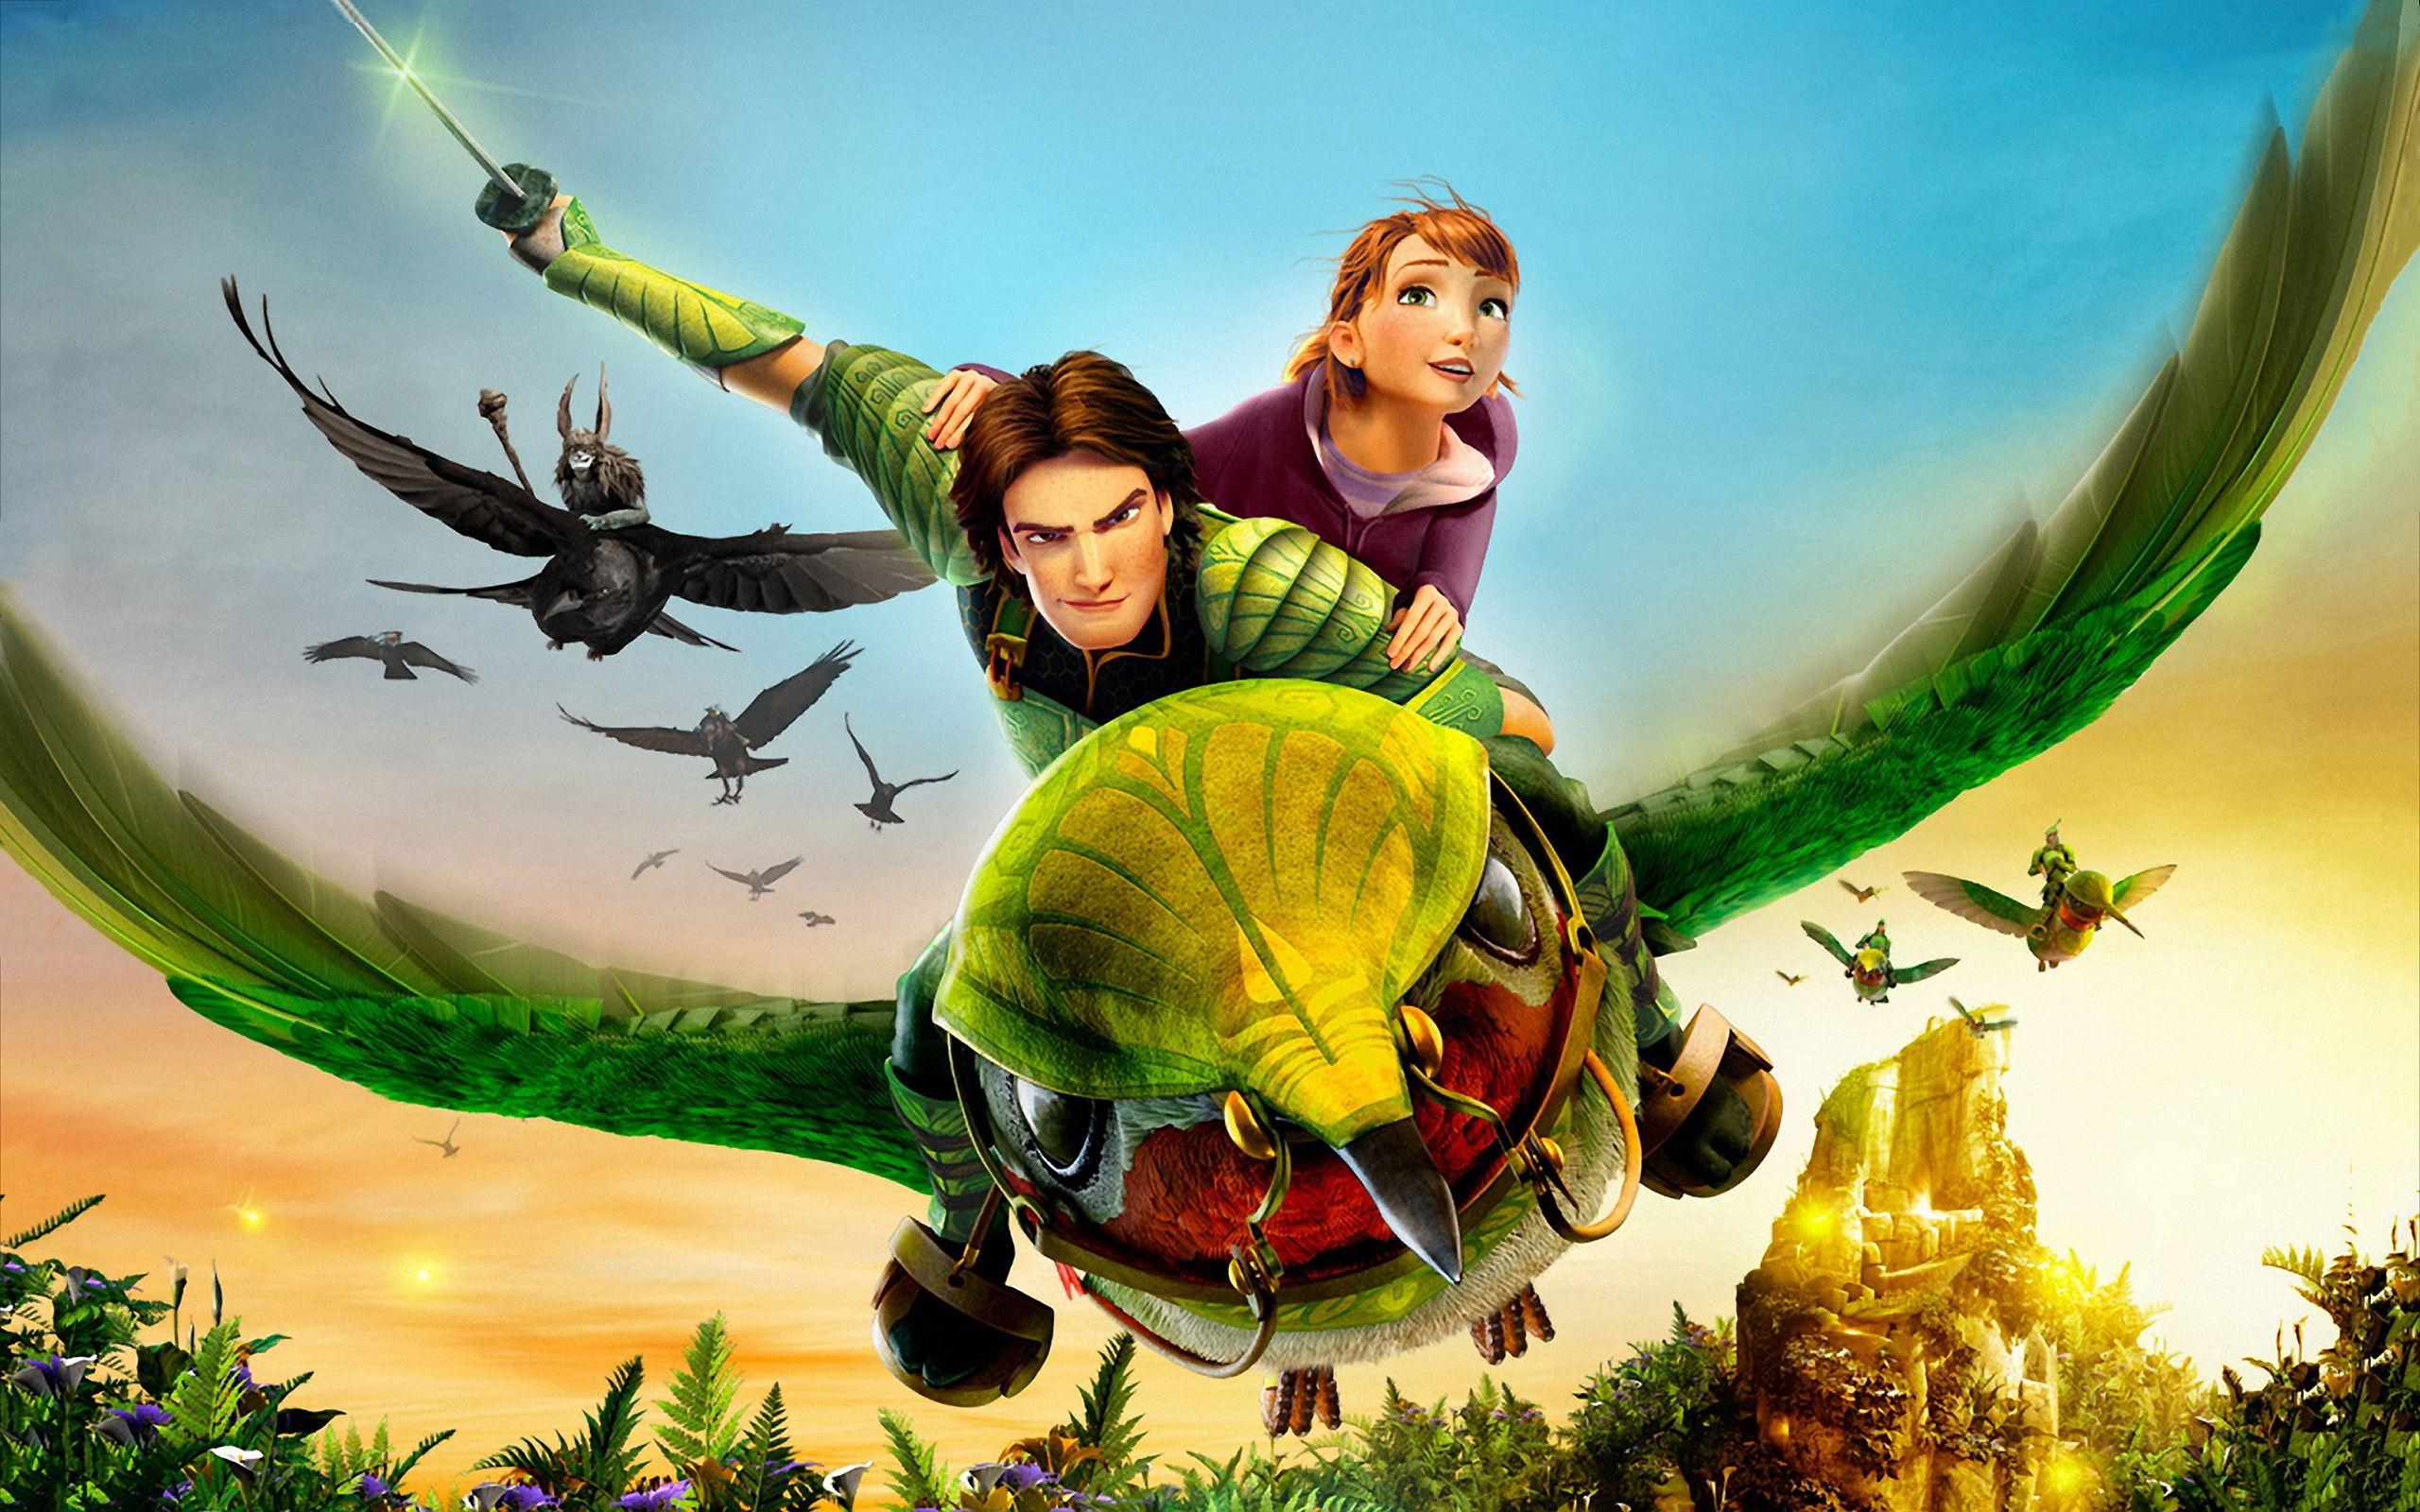 Animated Movies Wallpaper Hd 2560x1600 Download Hd Wallpaper Wallpapertip